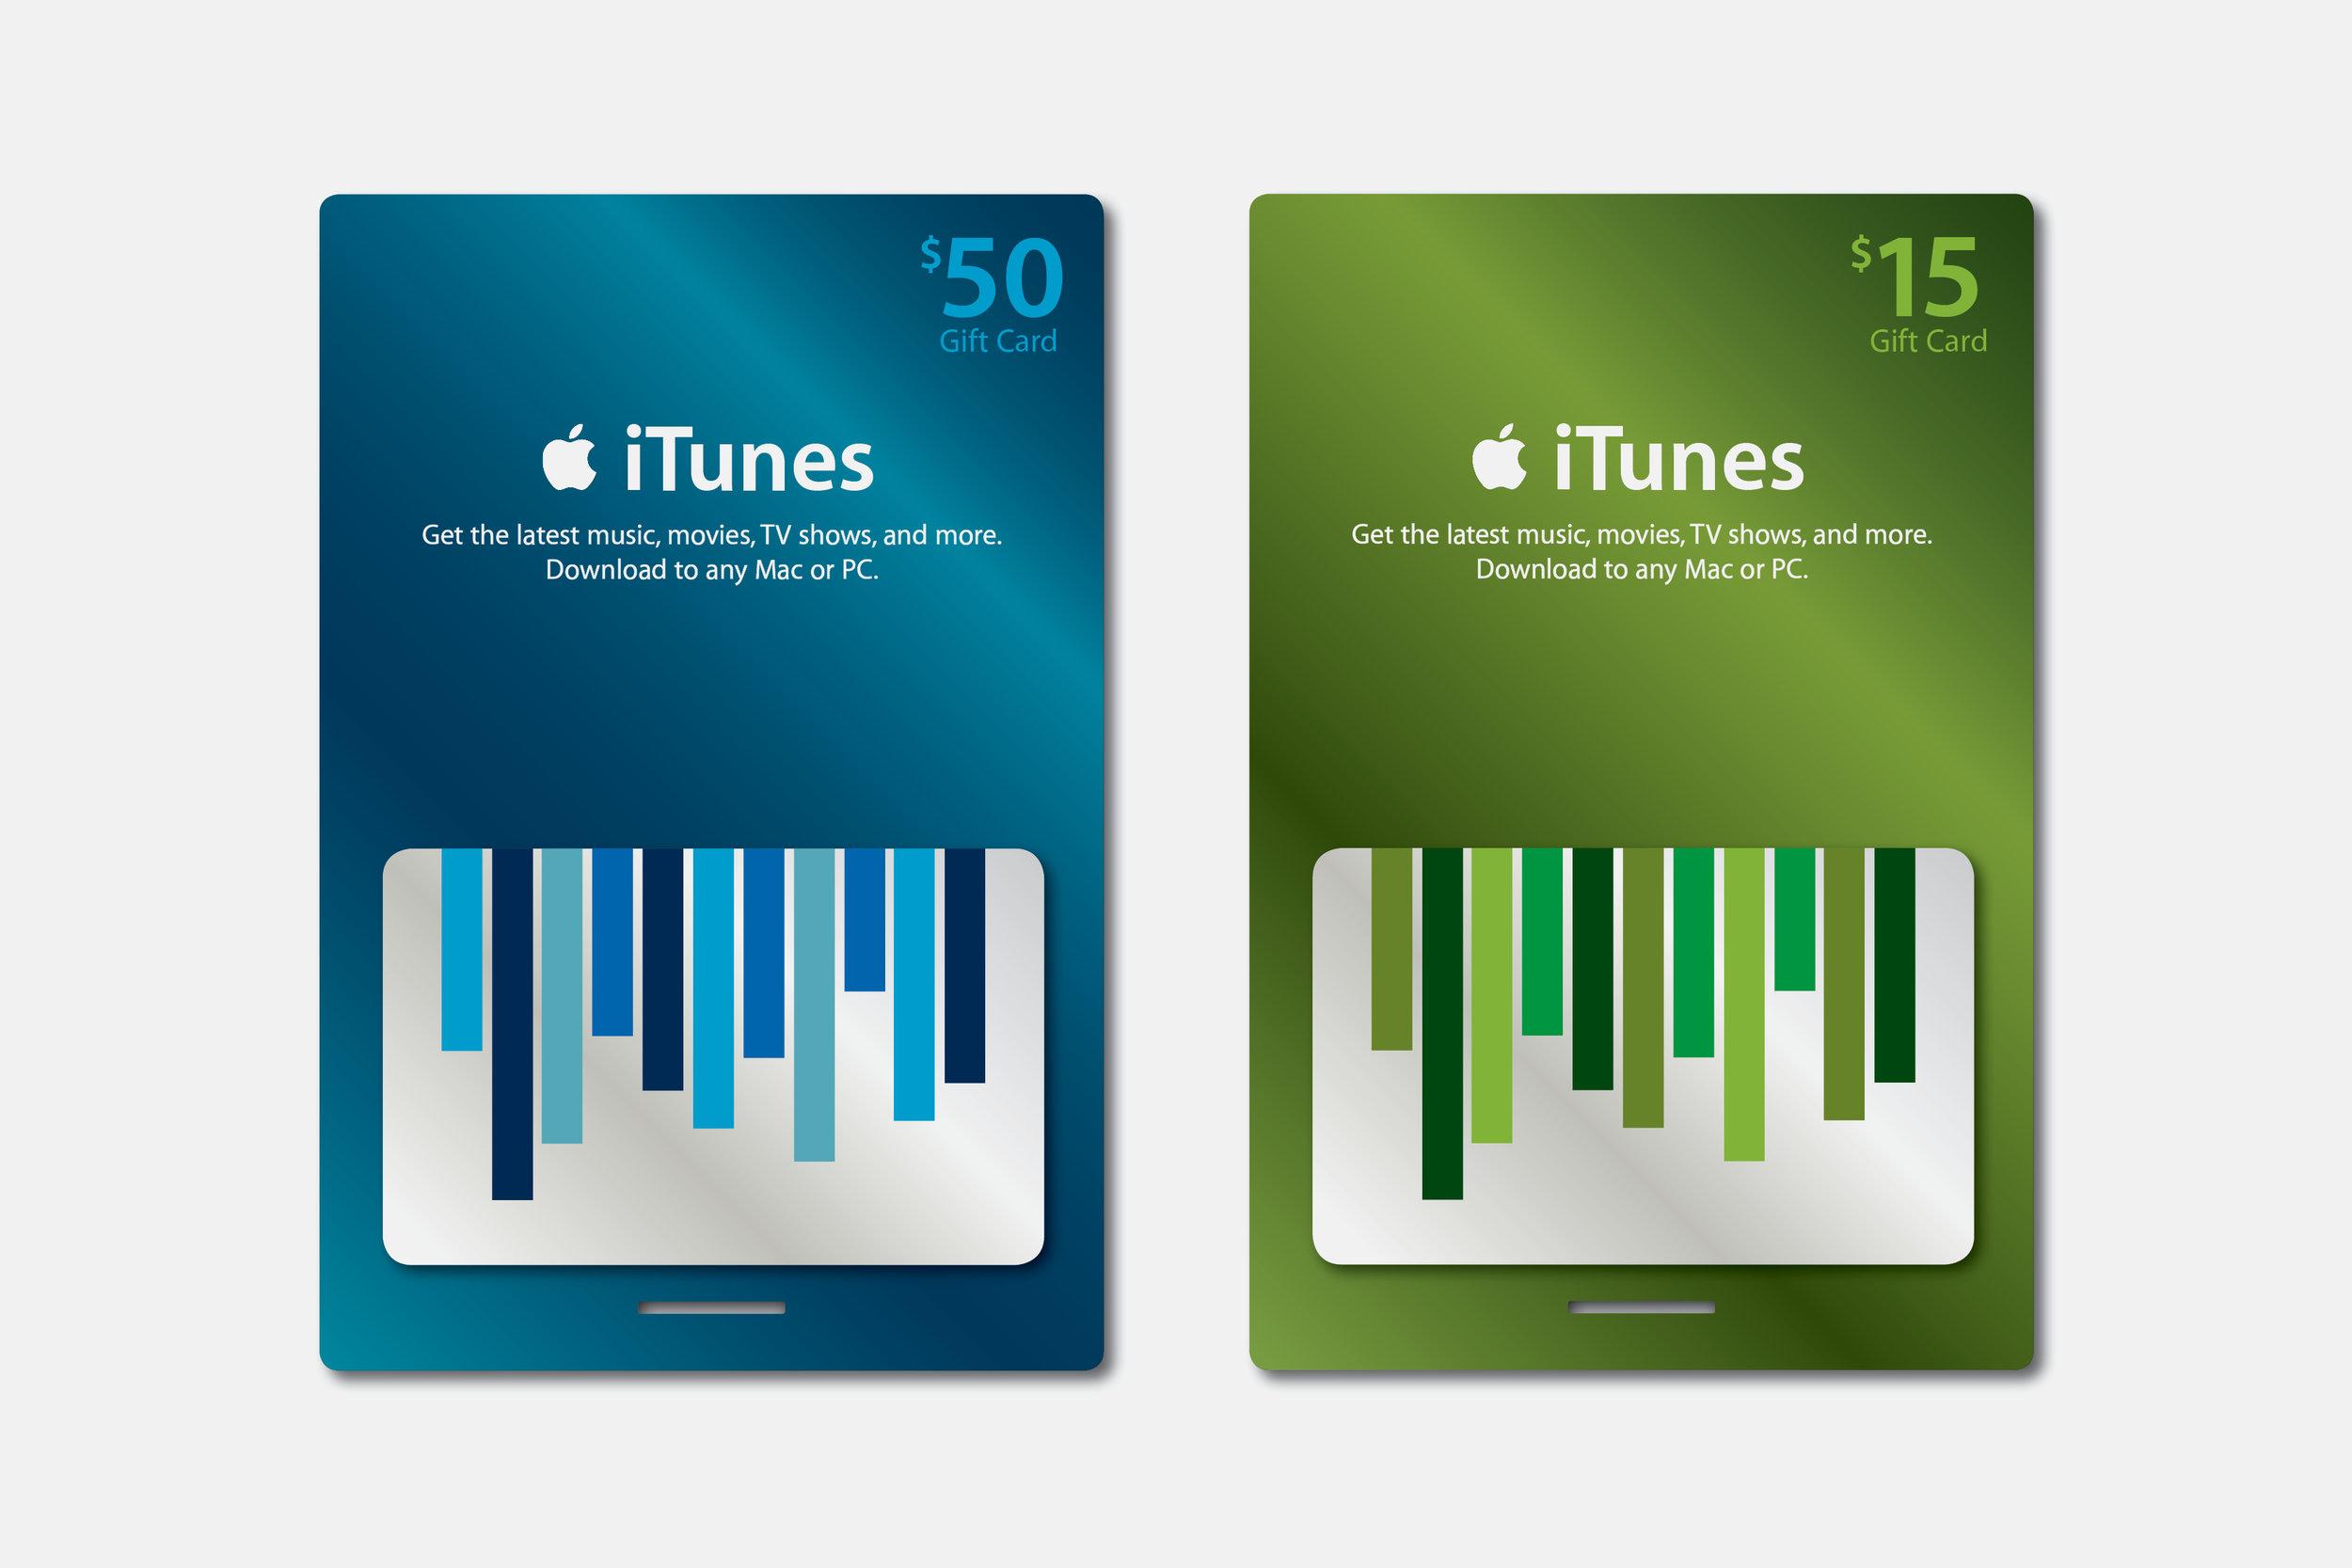 iTunes icicle2.jpg